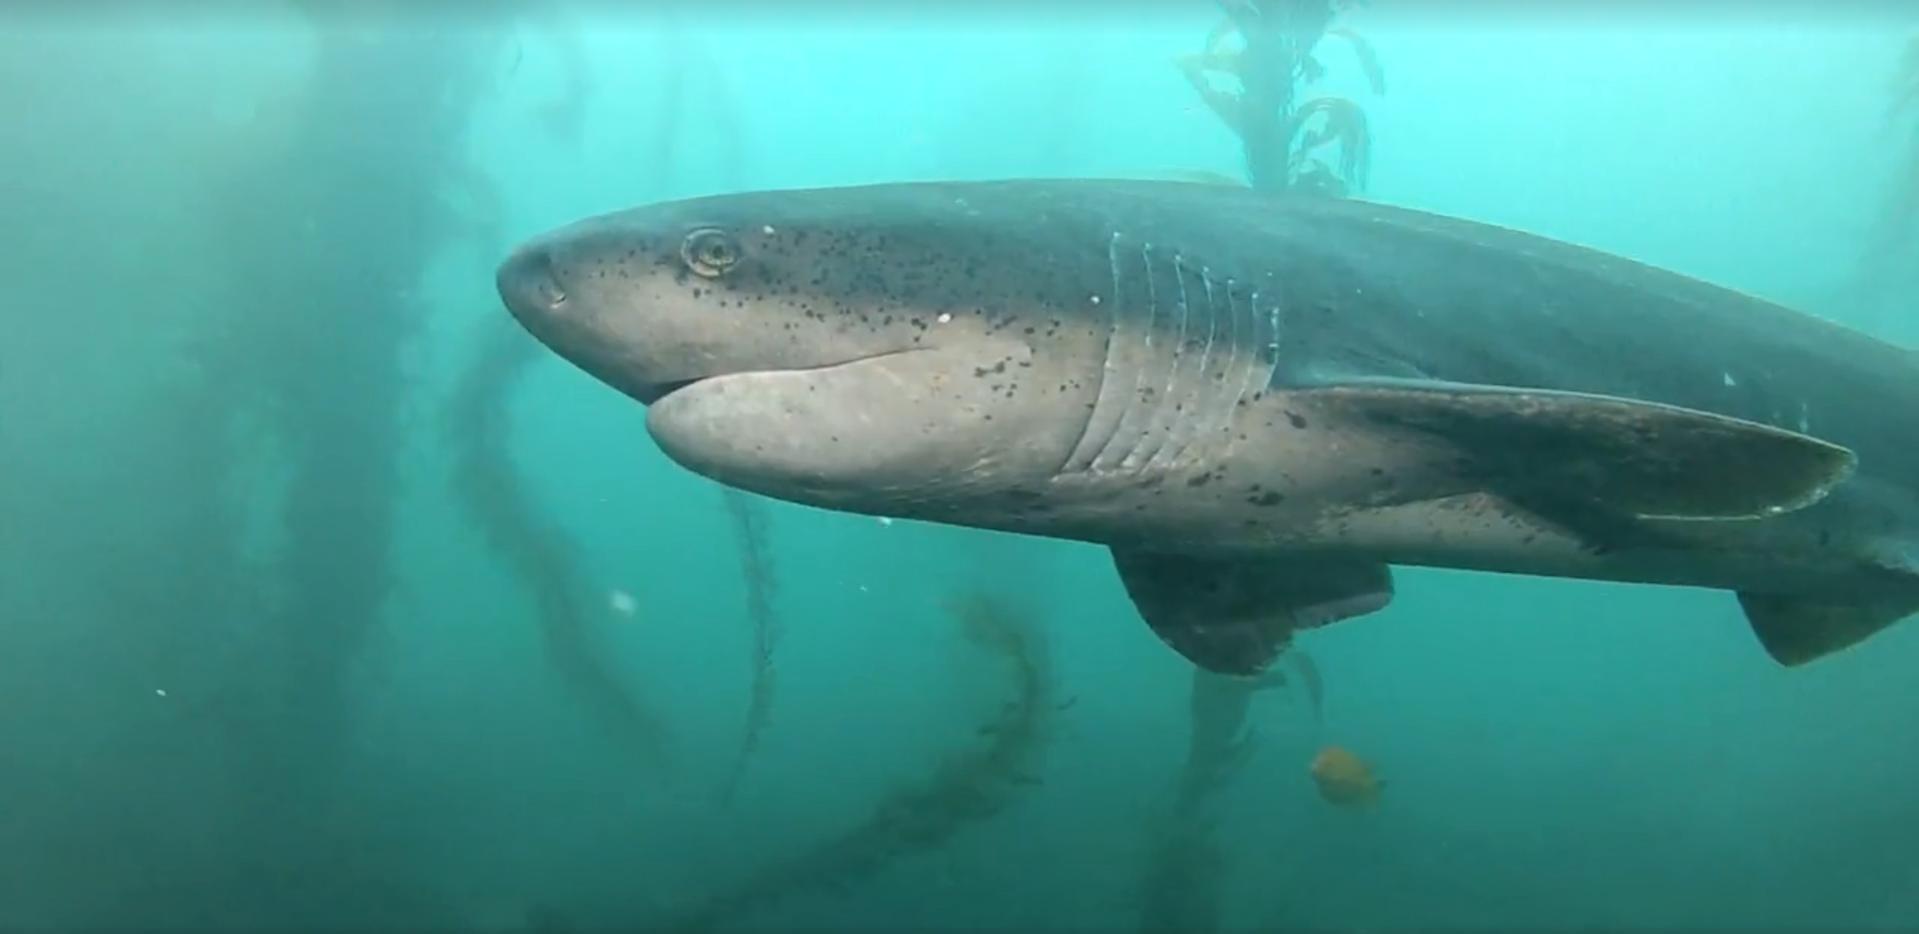 Sevengill shark at La Jolla Cove